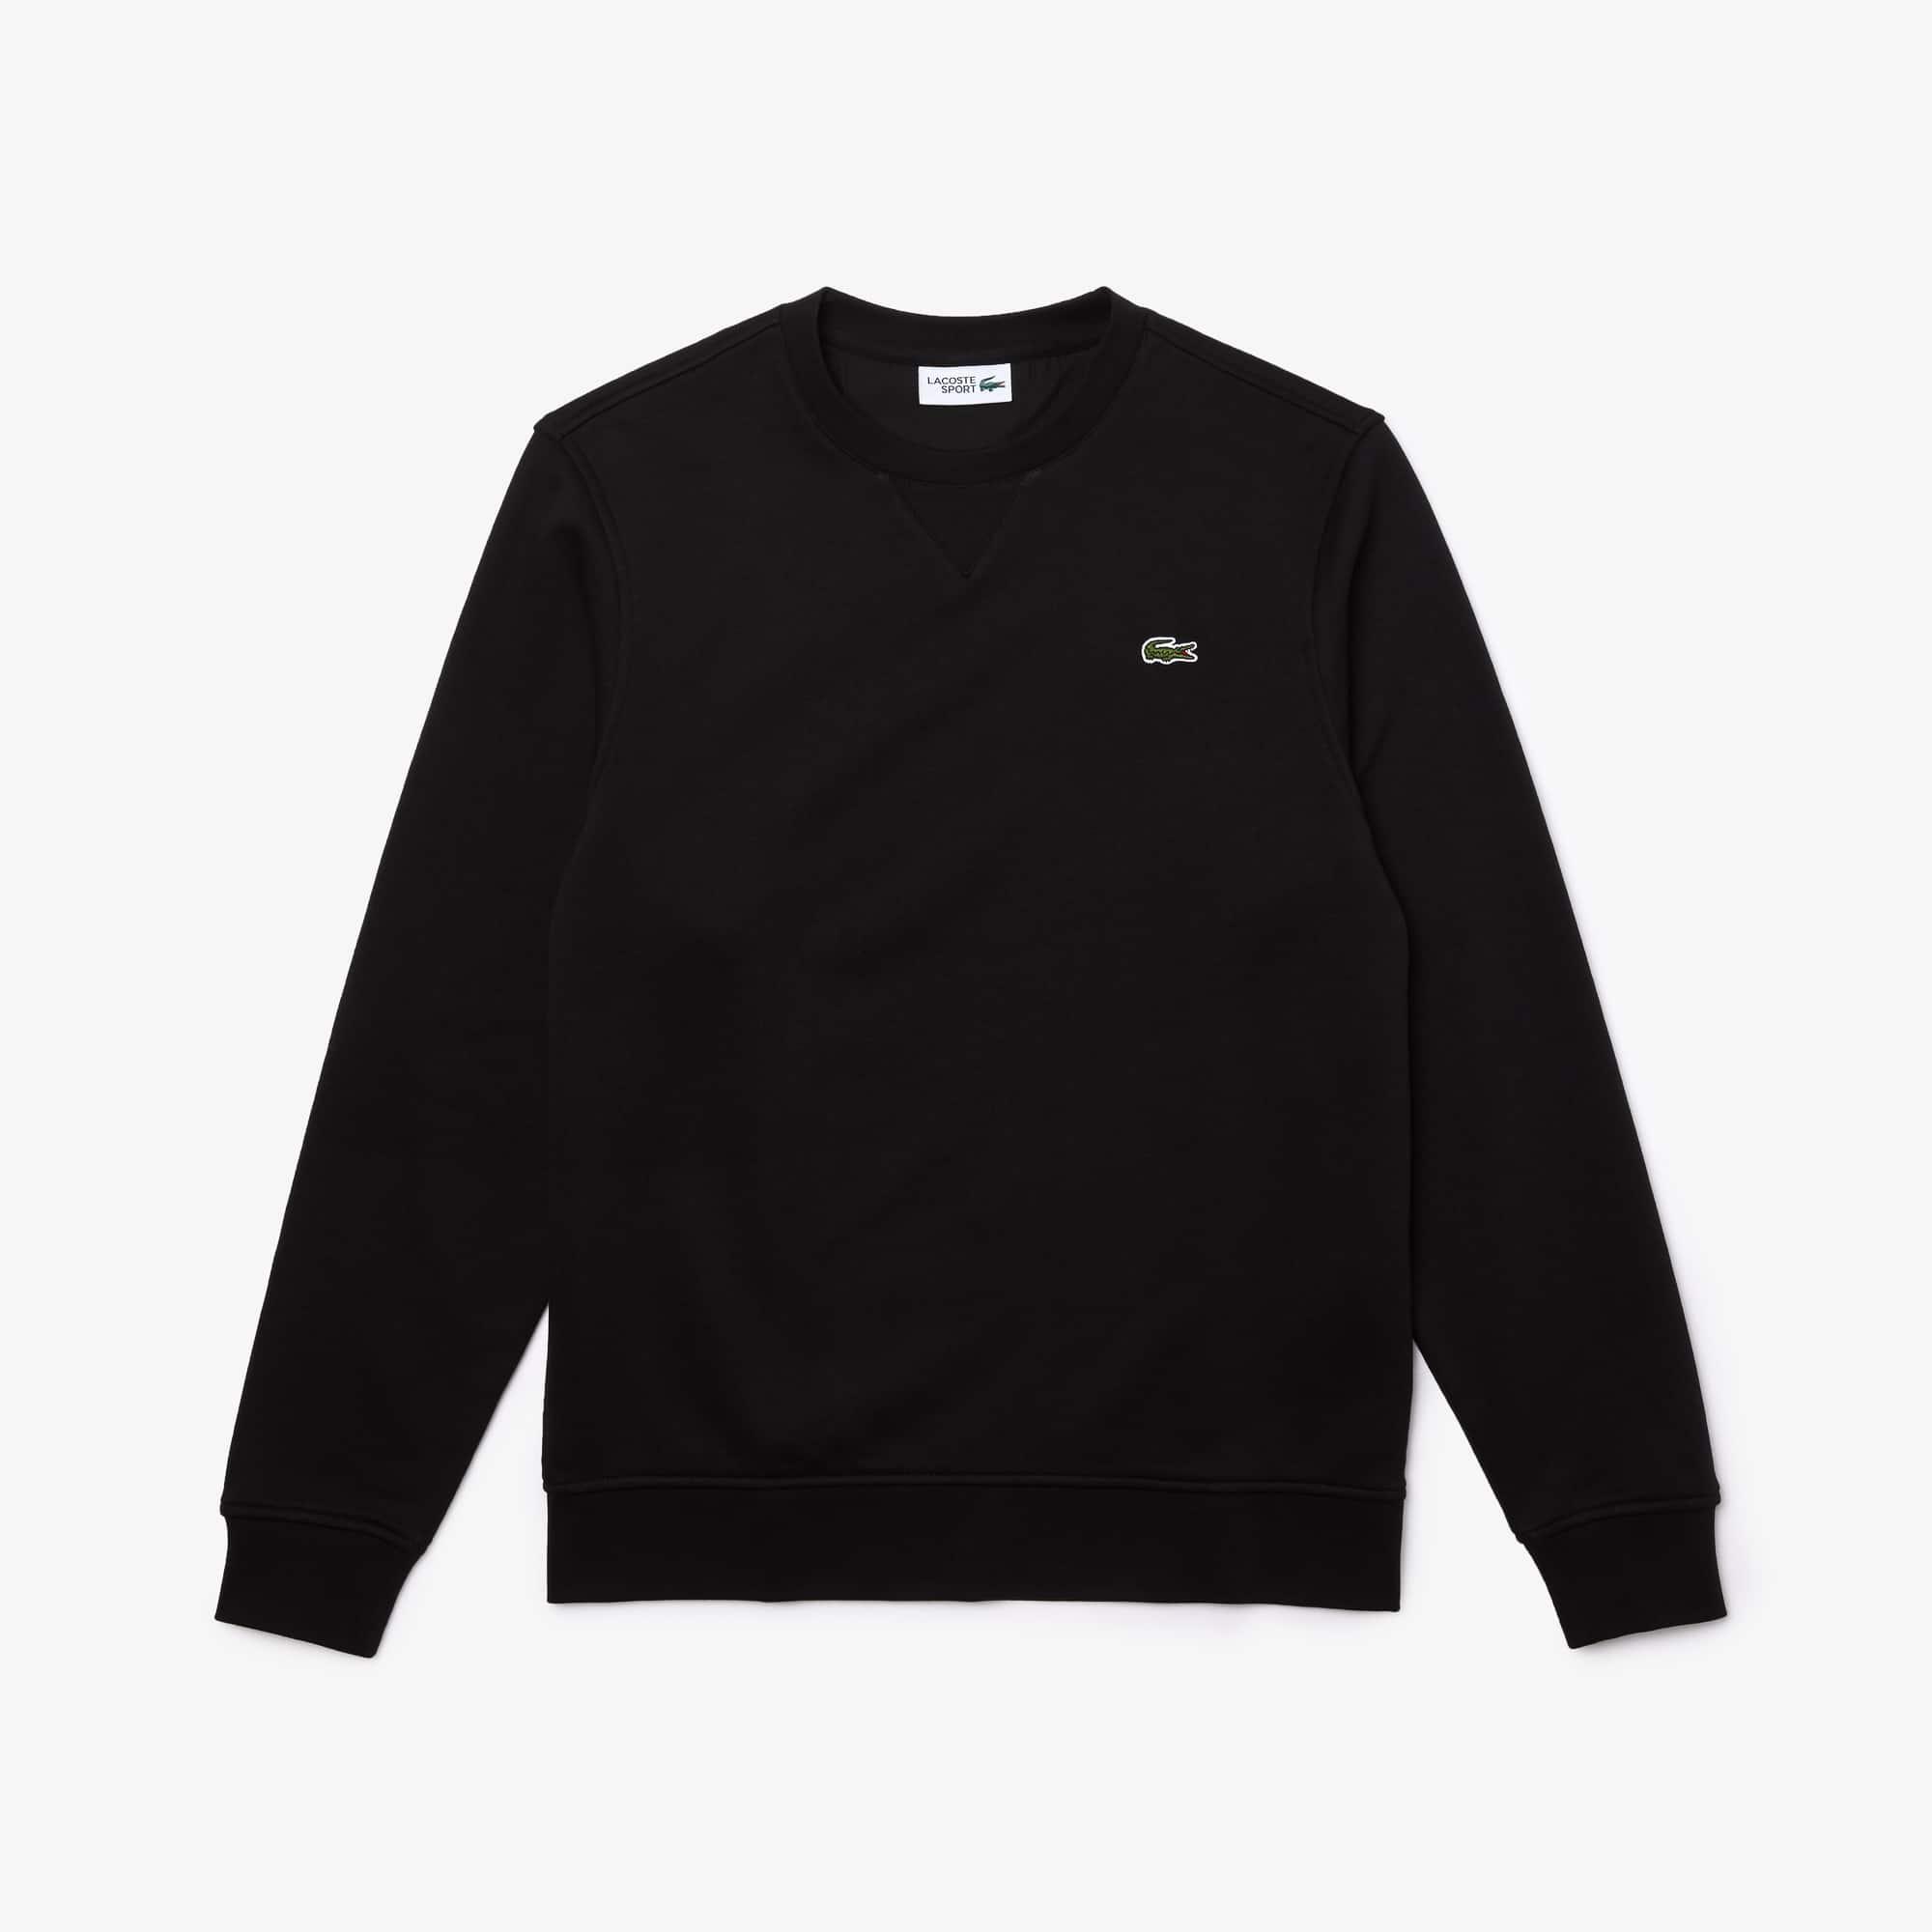 Mens 라코스테 Lacoste SPORT Cotton Blend Fleece Sweatshirt